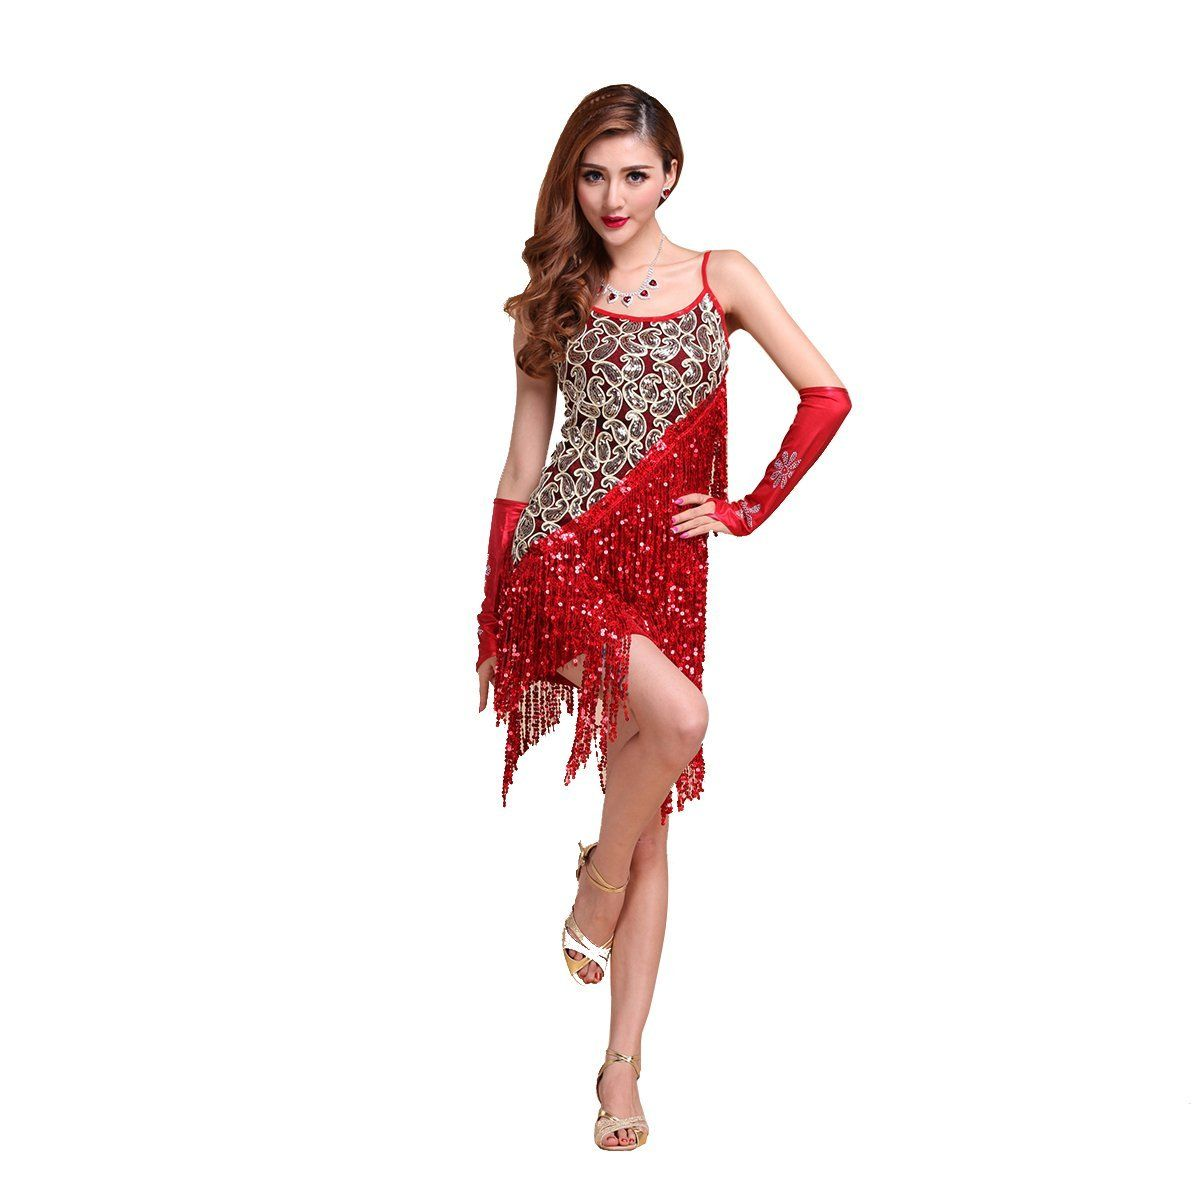 CoastaCloud-Señoras Volante Salsa Tango Flamenco Baile Latino Elegante  Vestido Rojo sin guantes L 44c541b971571